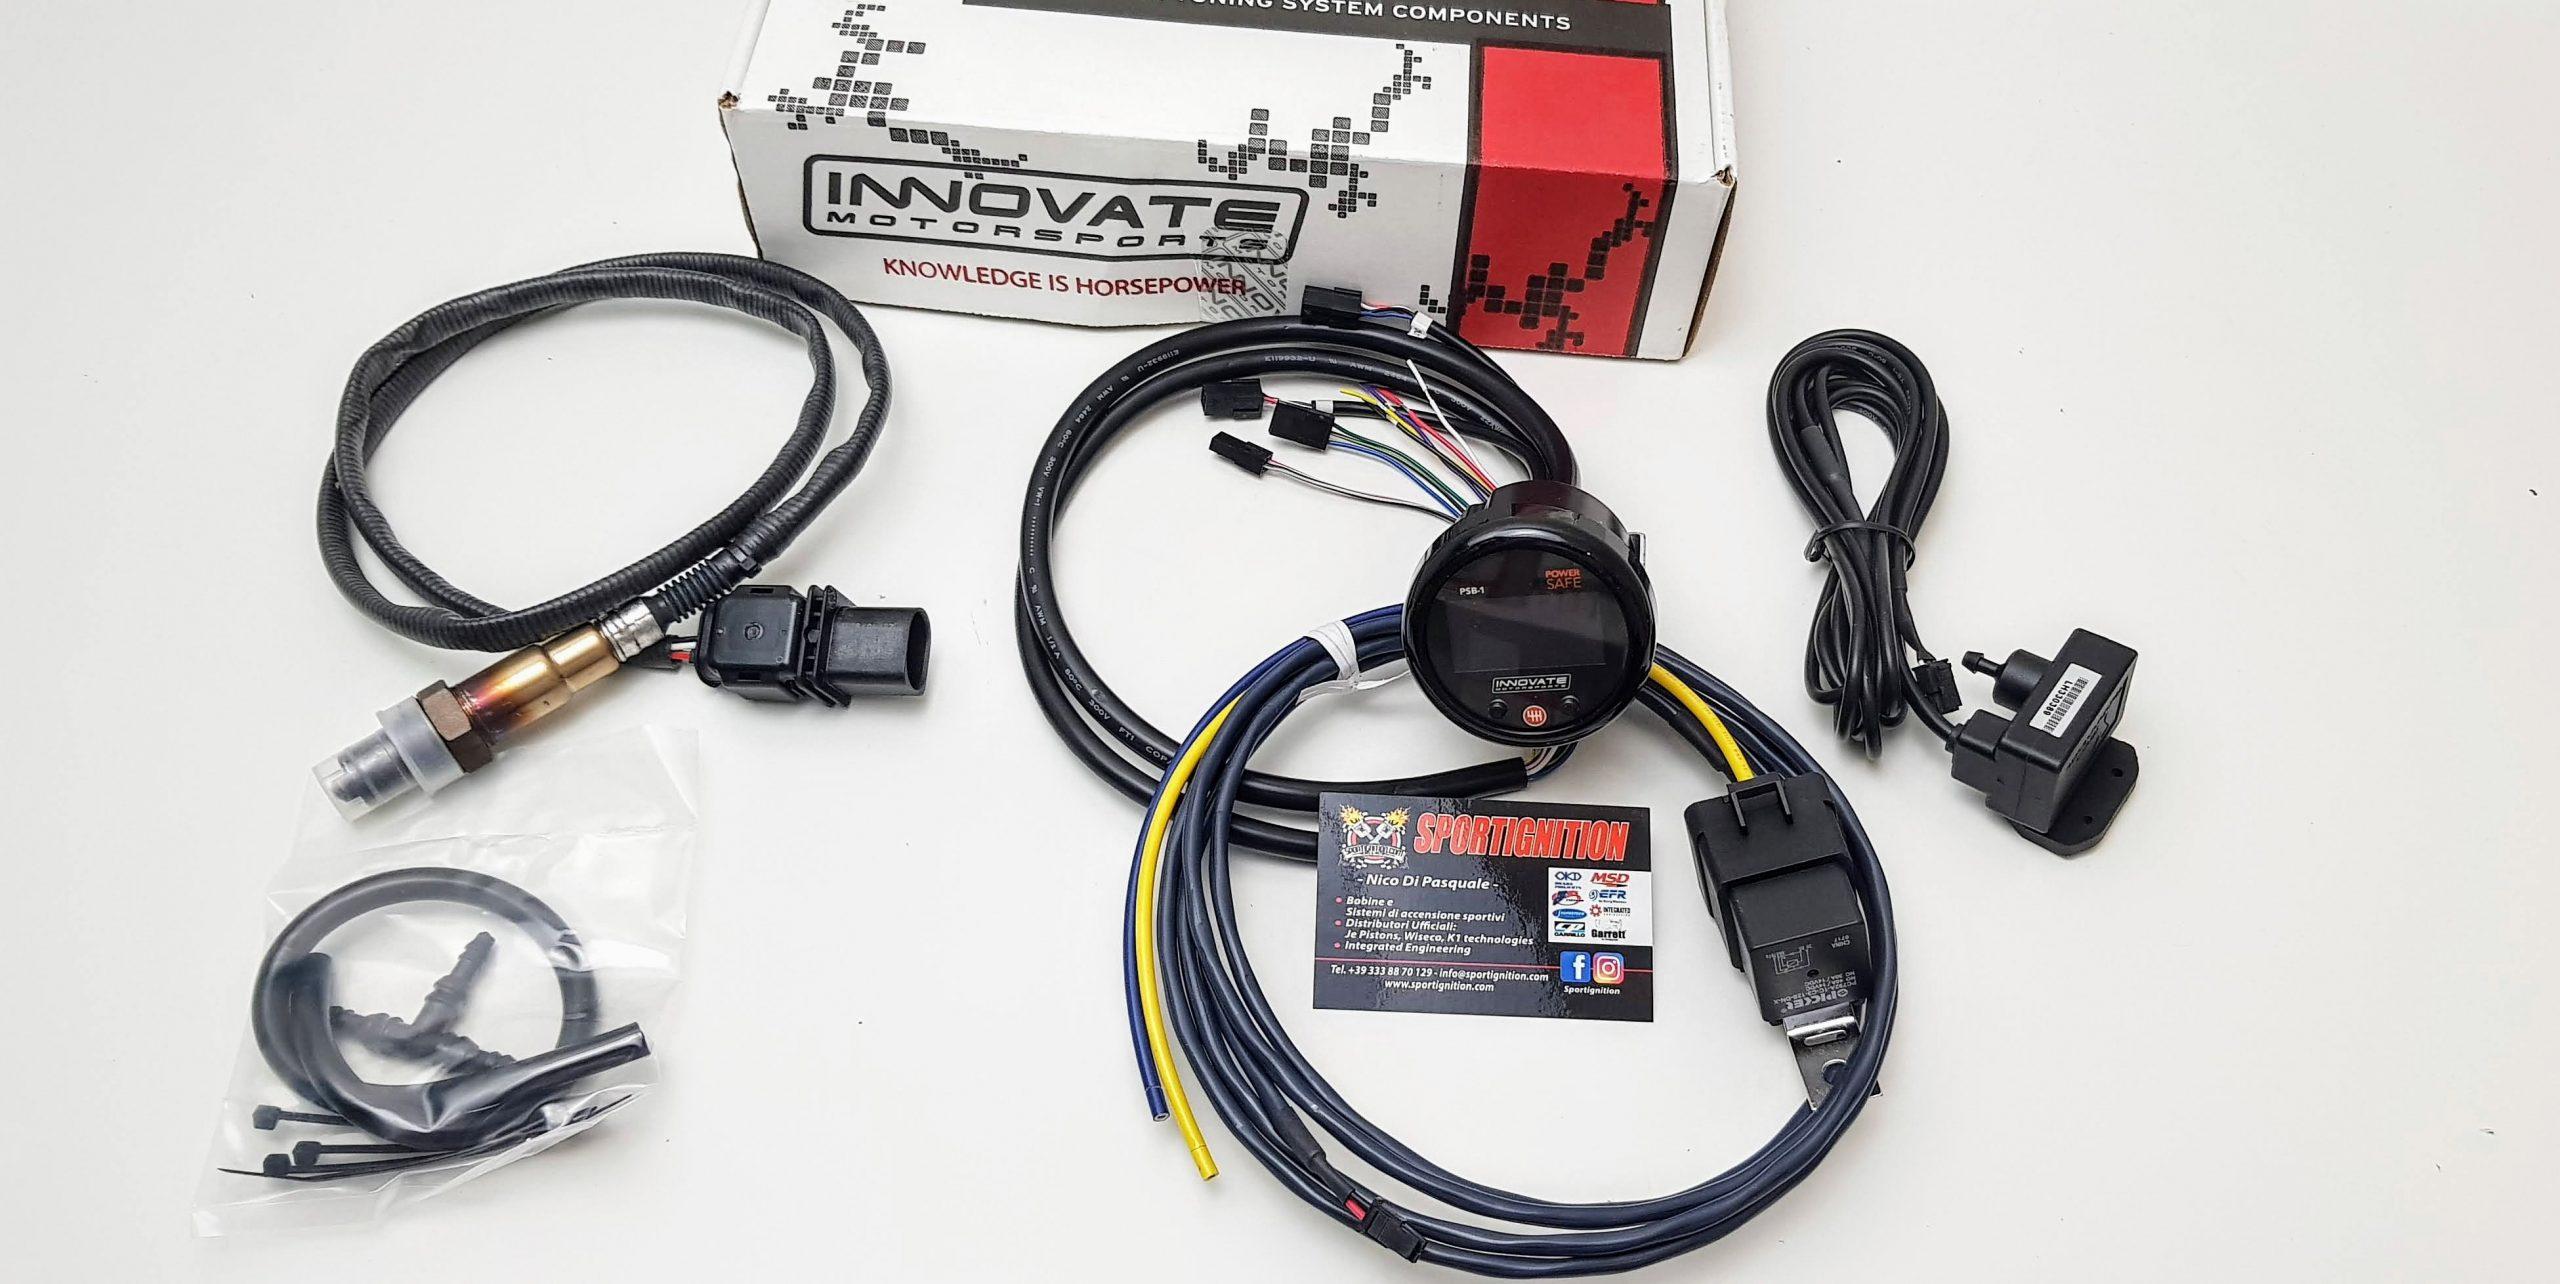 13-powersafe-boost-air-fuel-ratio-wideband-gauge